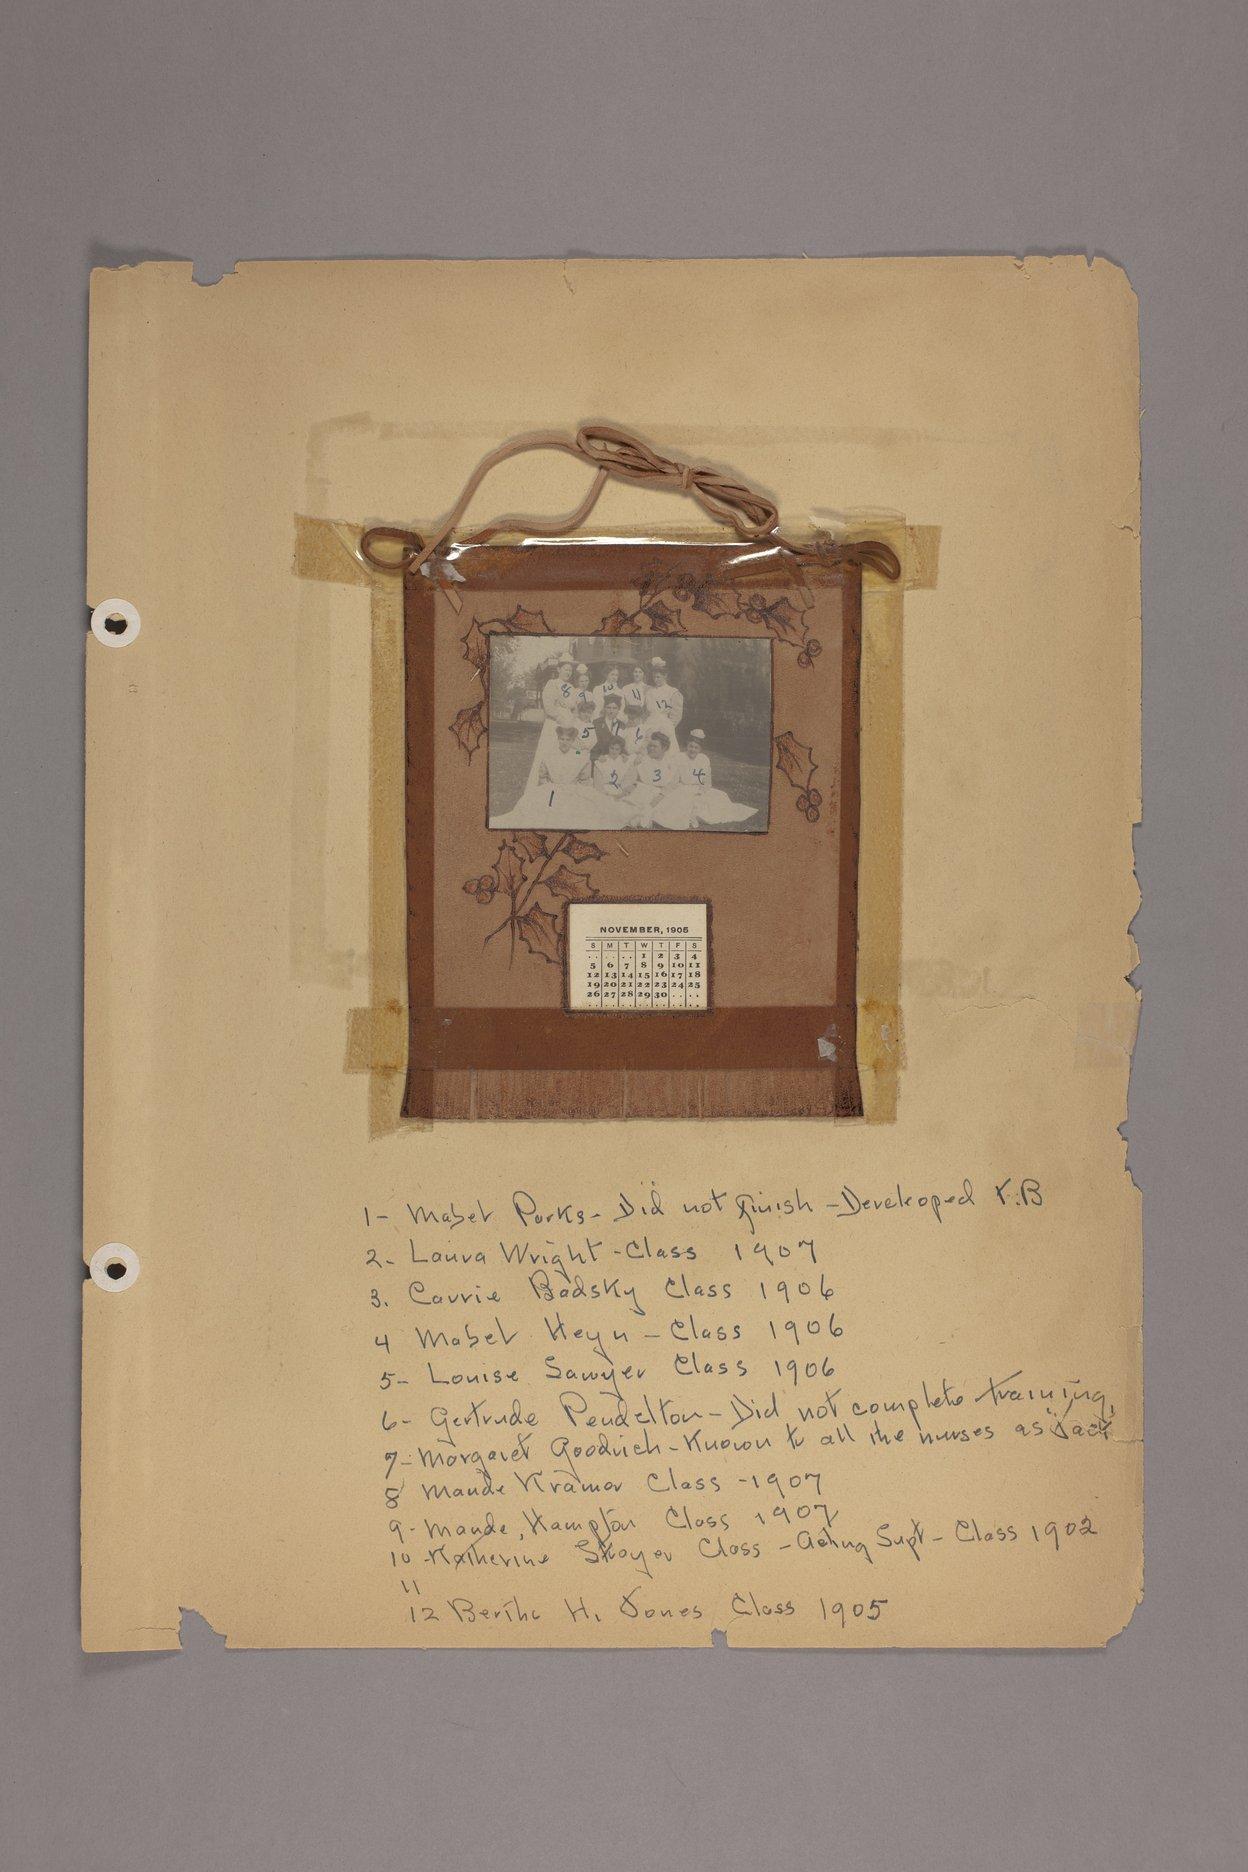 Bertha Jones scrapbook - 12 List: nursing students, 1905-1907